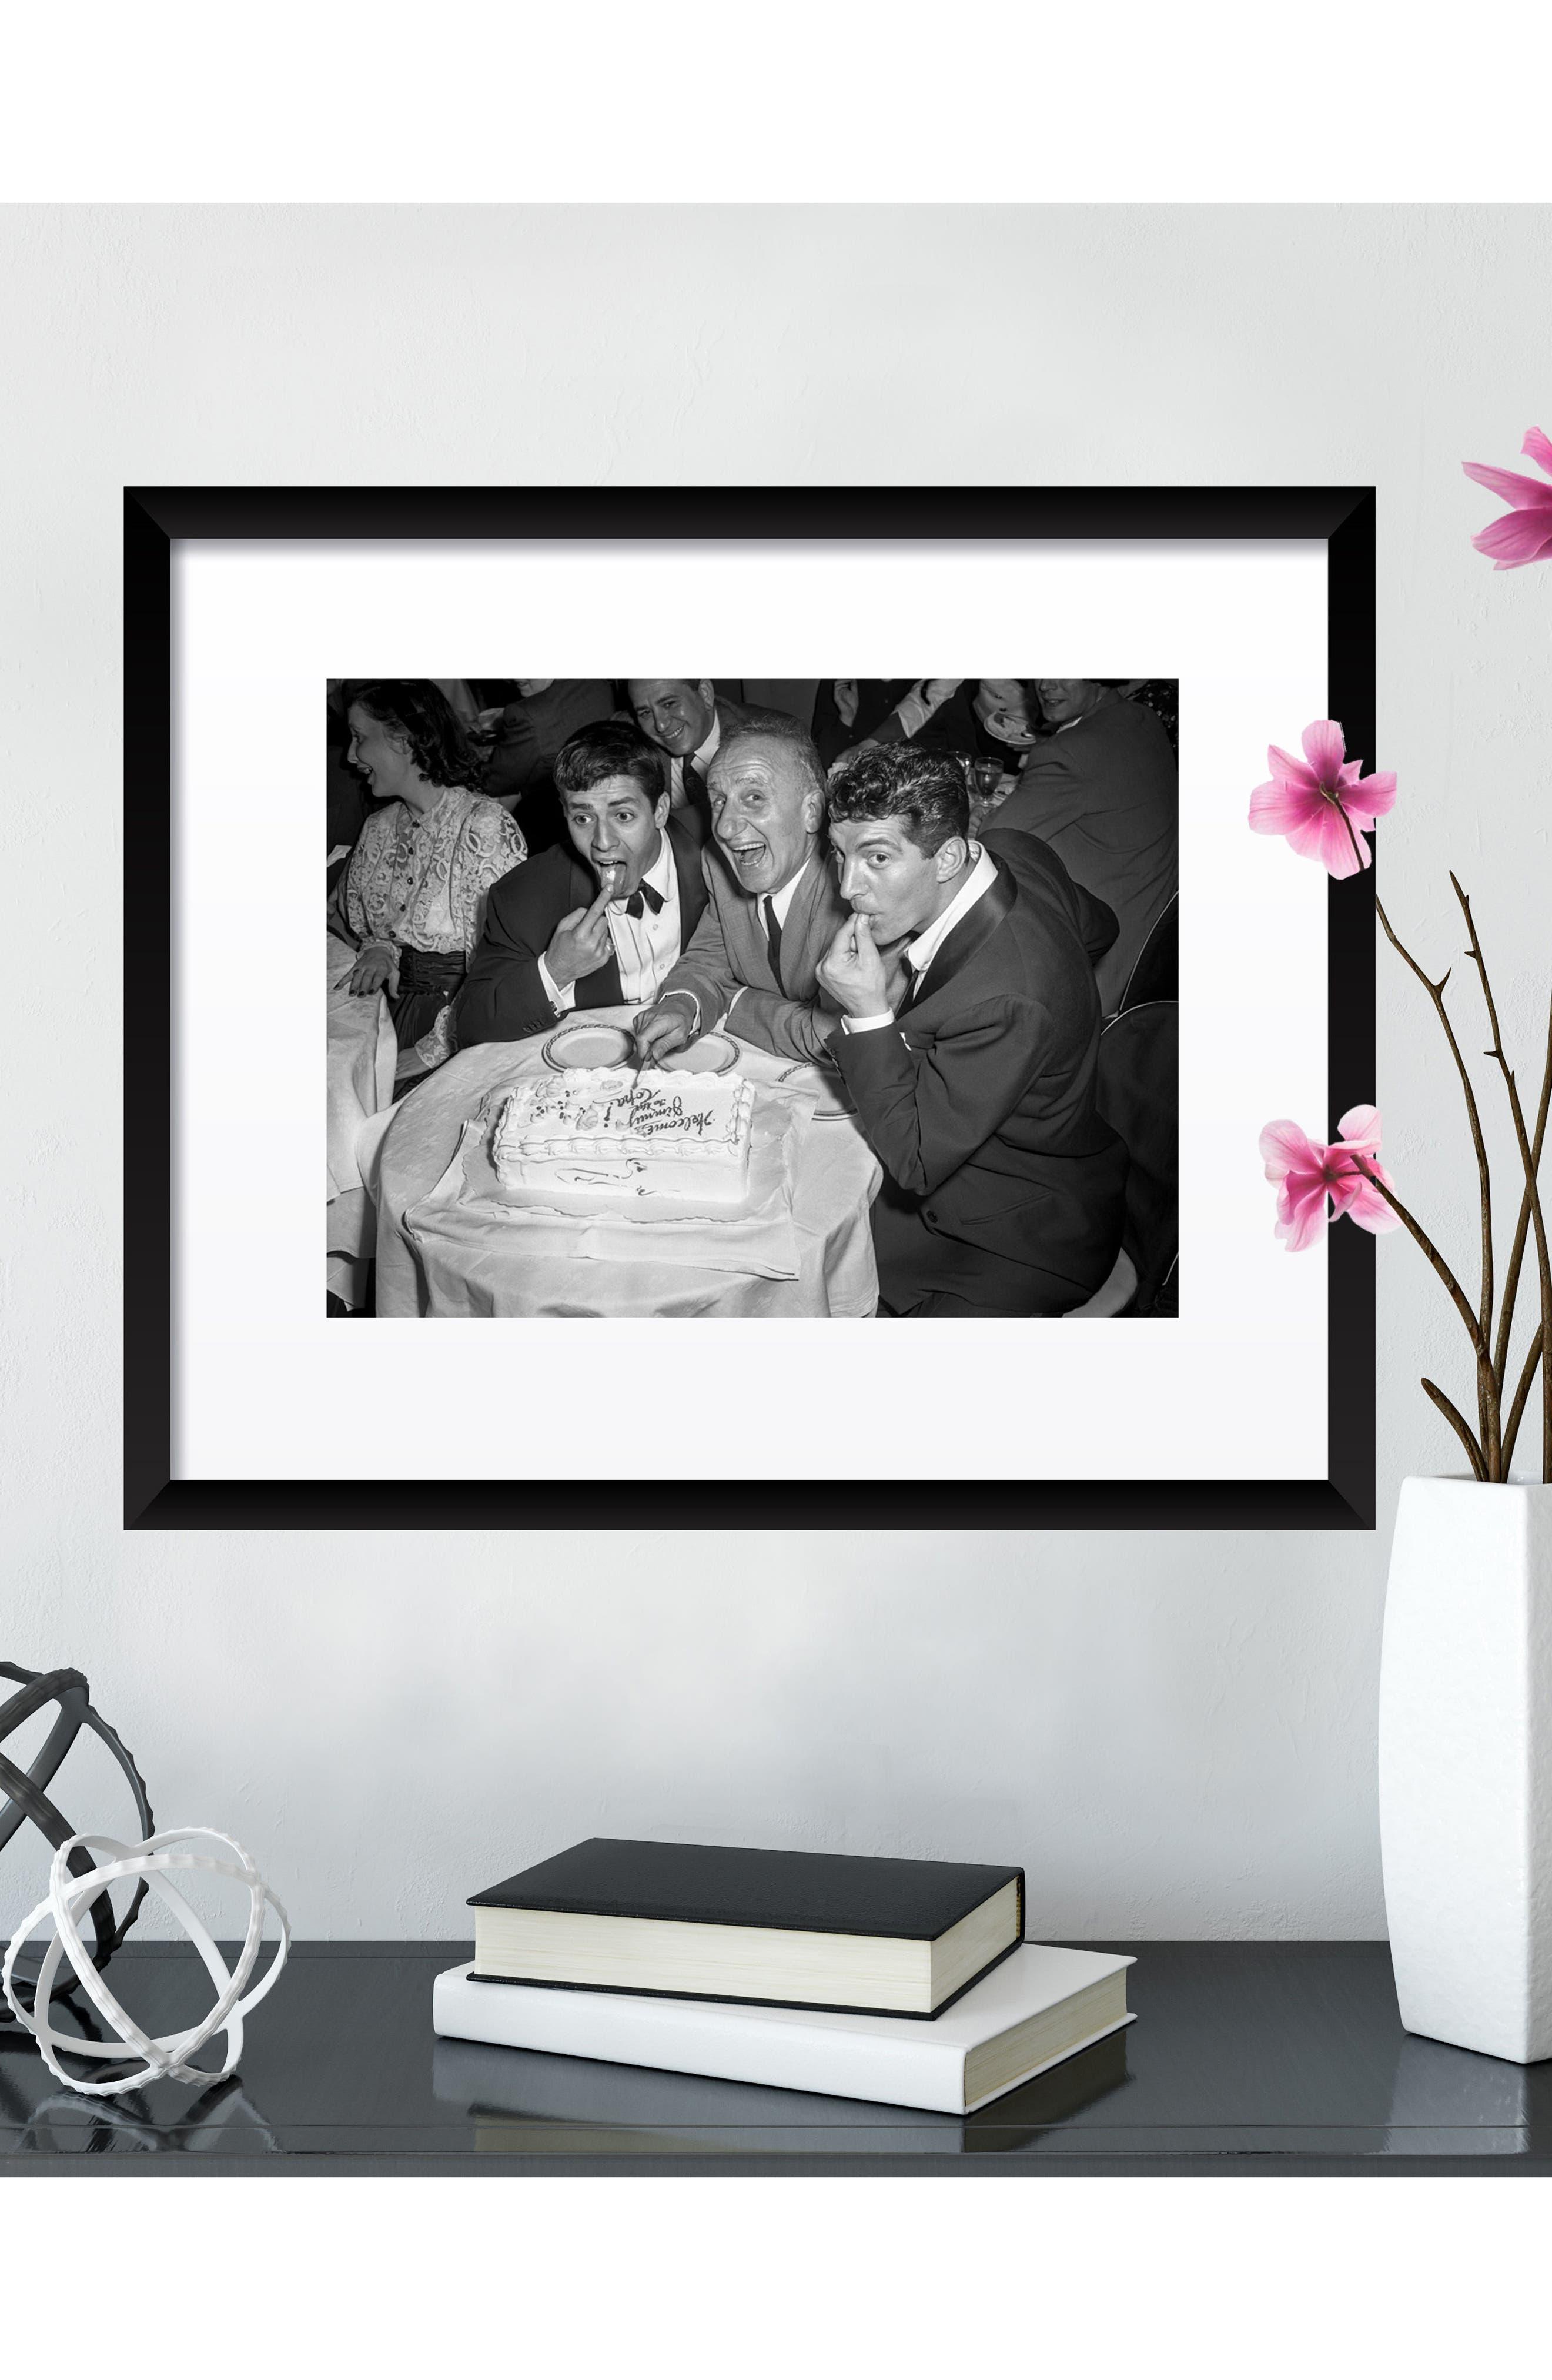 Jerry & Dean with Jimmy Durante Fine Art Print,                             Alternate thumbnail 4, color,                             BLACK